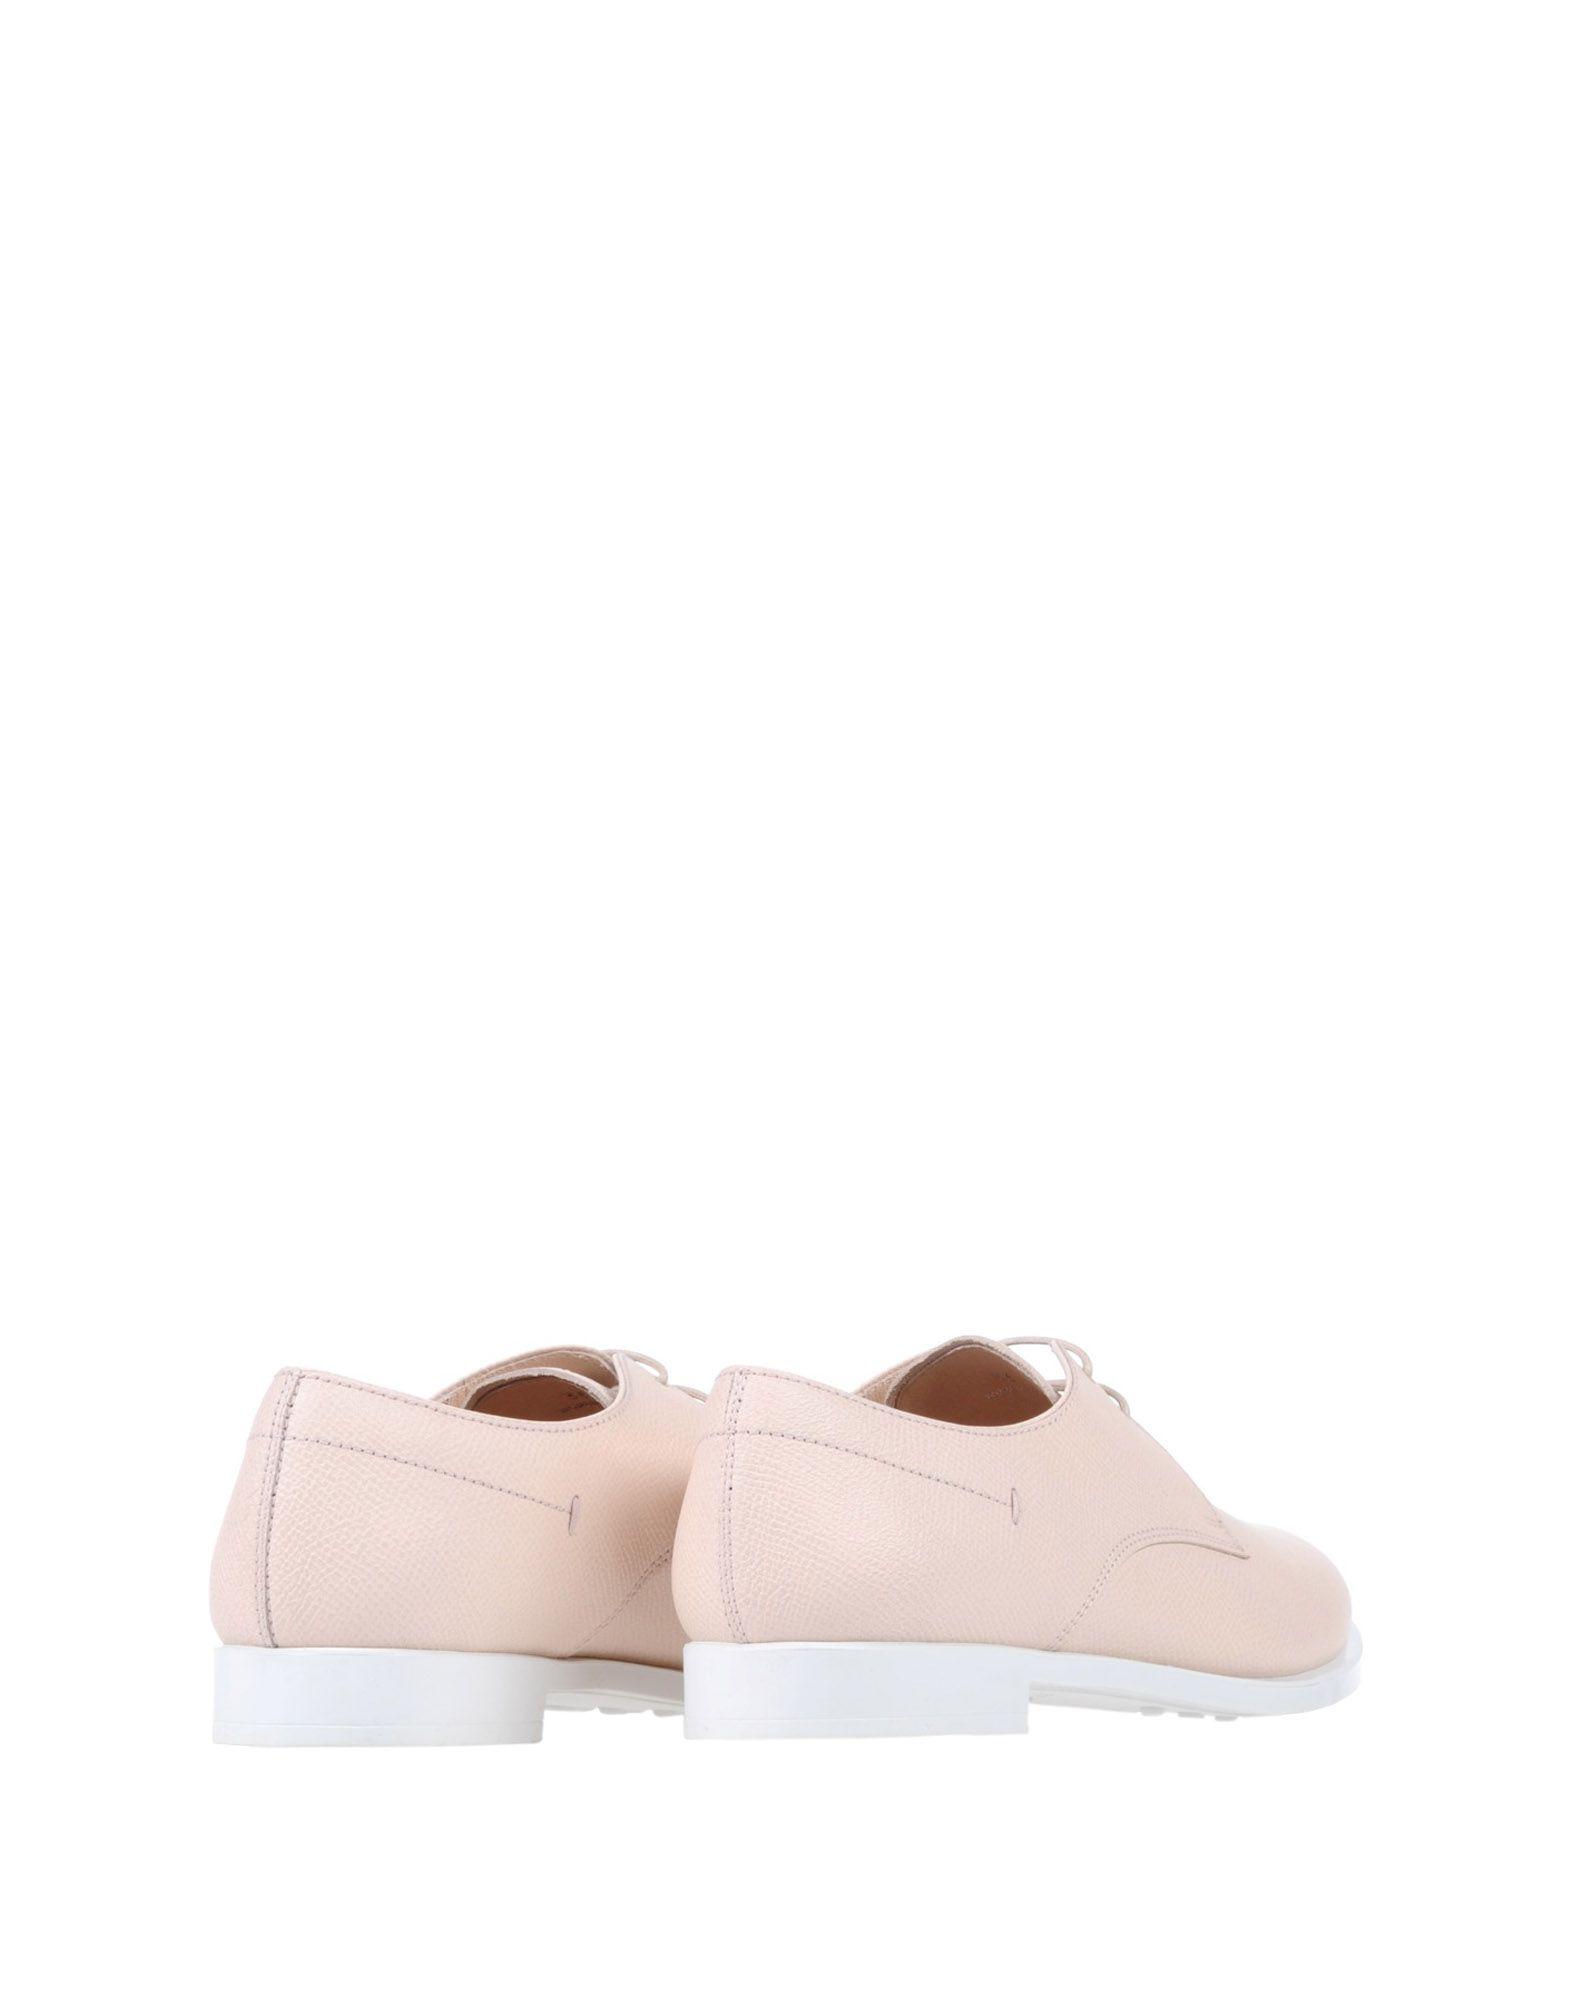 Chaussures - 18 Kt Tribunaux NaSCiKH